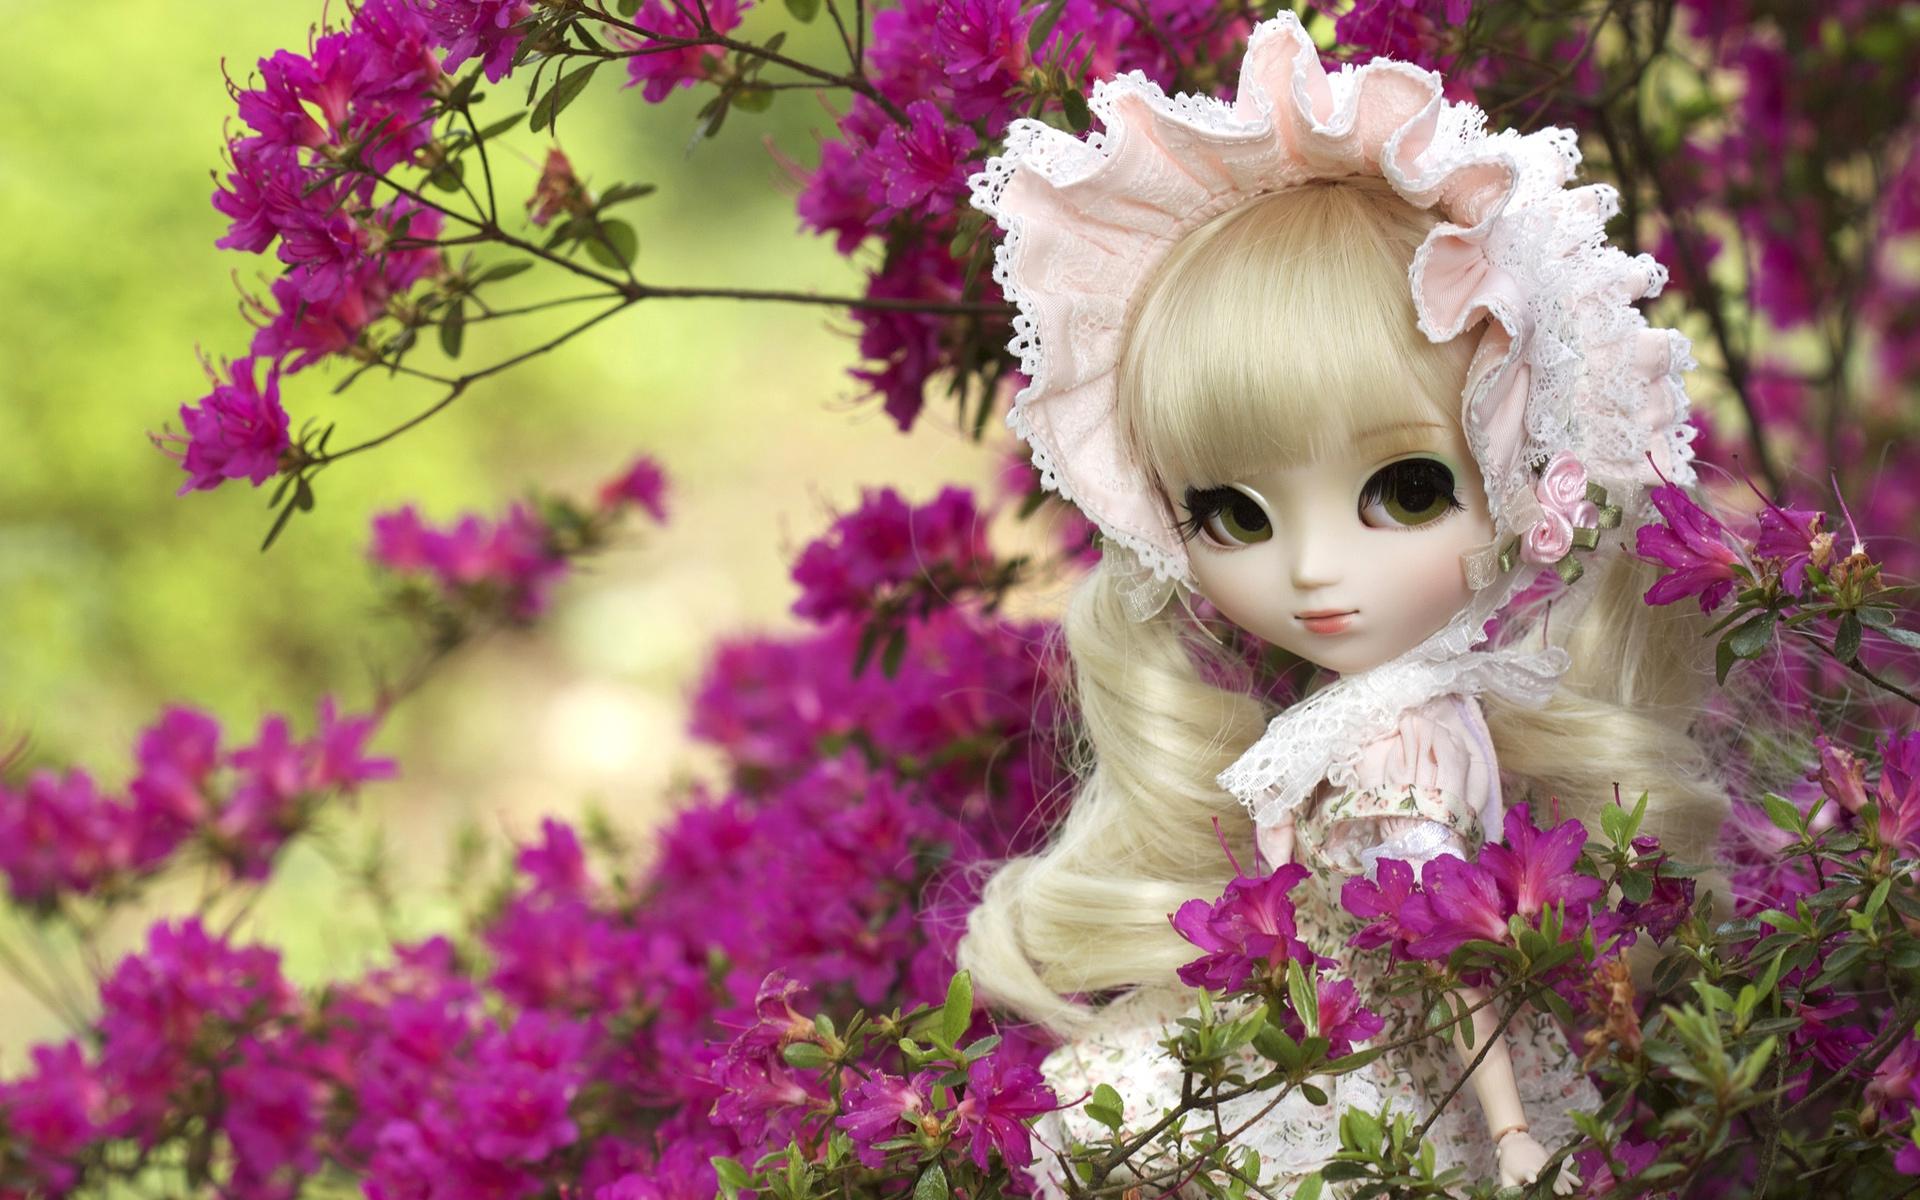 Cute Doll Girl HD Wallpaper 1920x1200